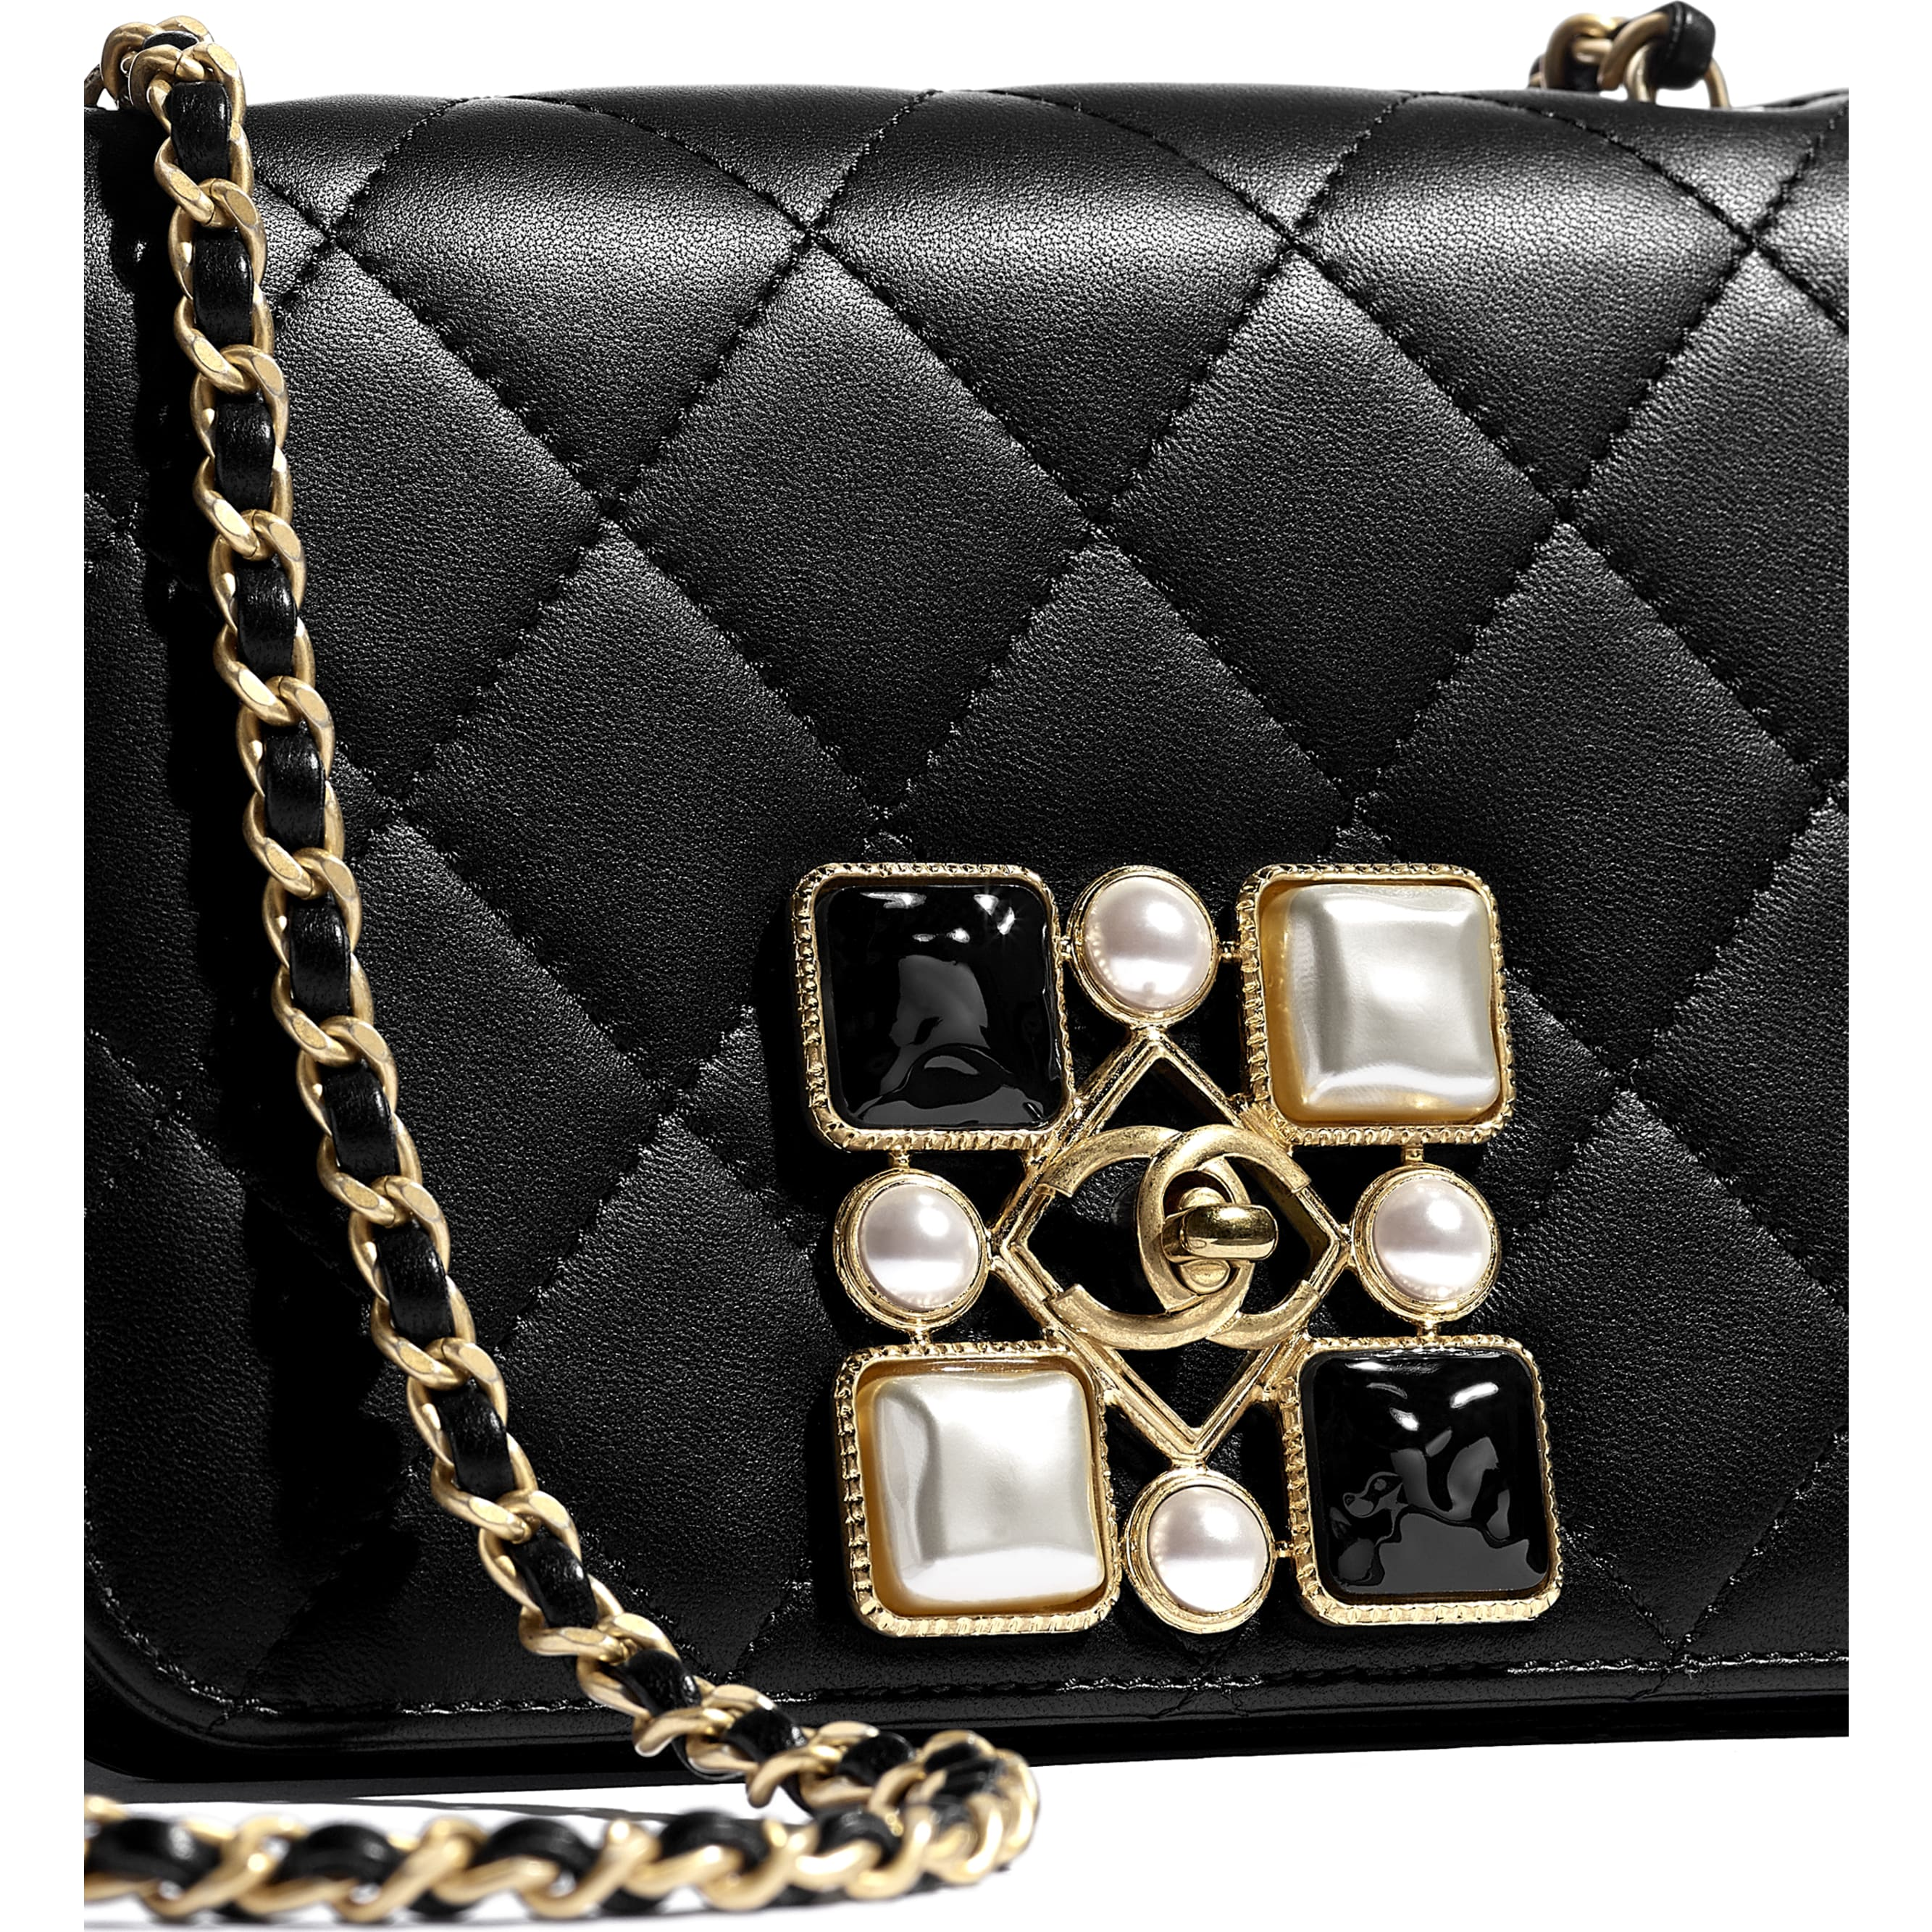 Bolsa - Black & White - Calfskin, Crystal Pearls, Resin & Gold-Tone Metal - CHANEL - Vista extra - ver a versão em tamanho standard